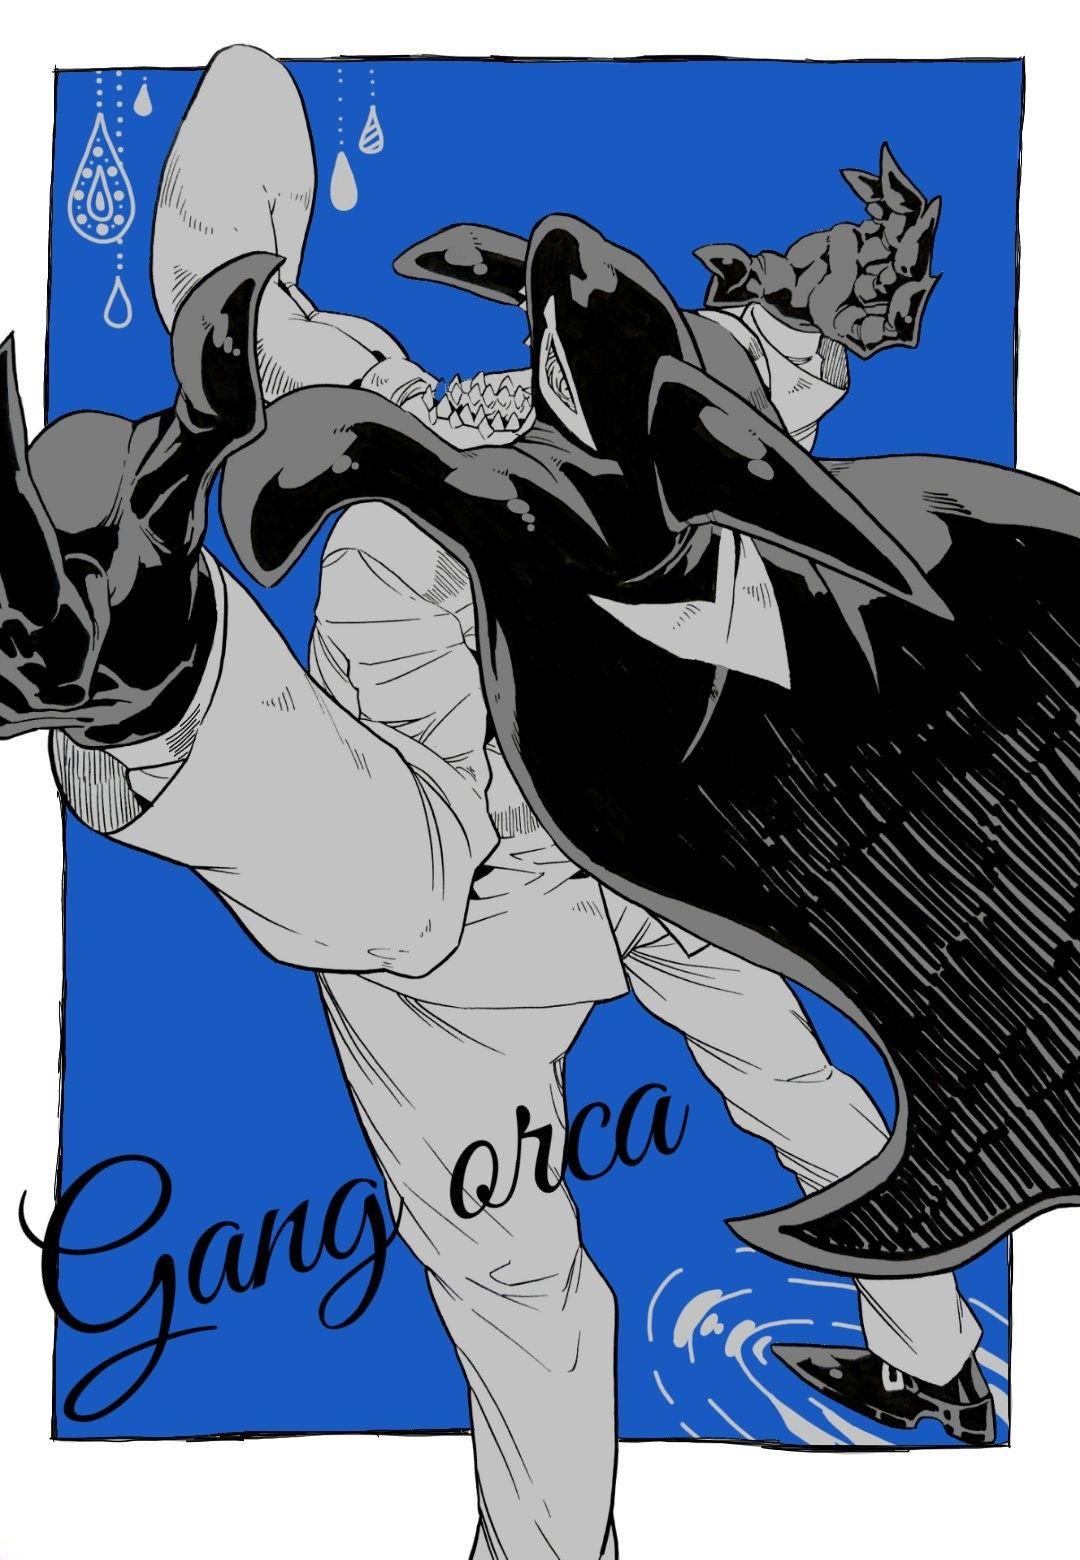 Pin by Nasherix on Bnha Art Anime shows, Hero, Anime